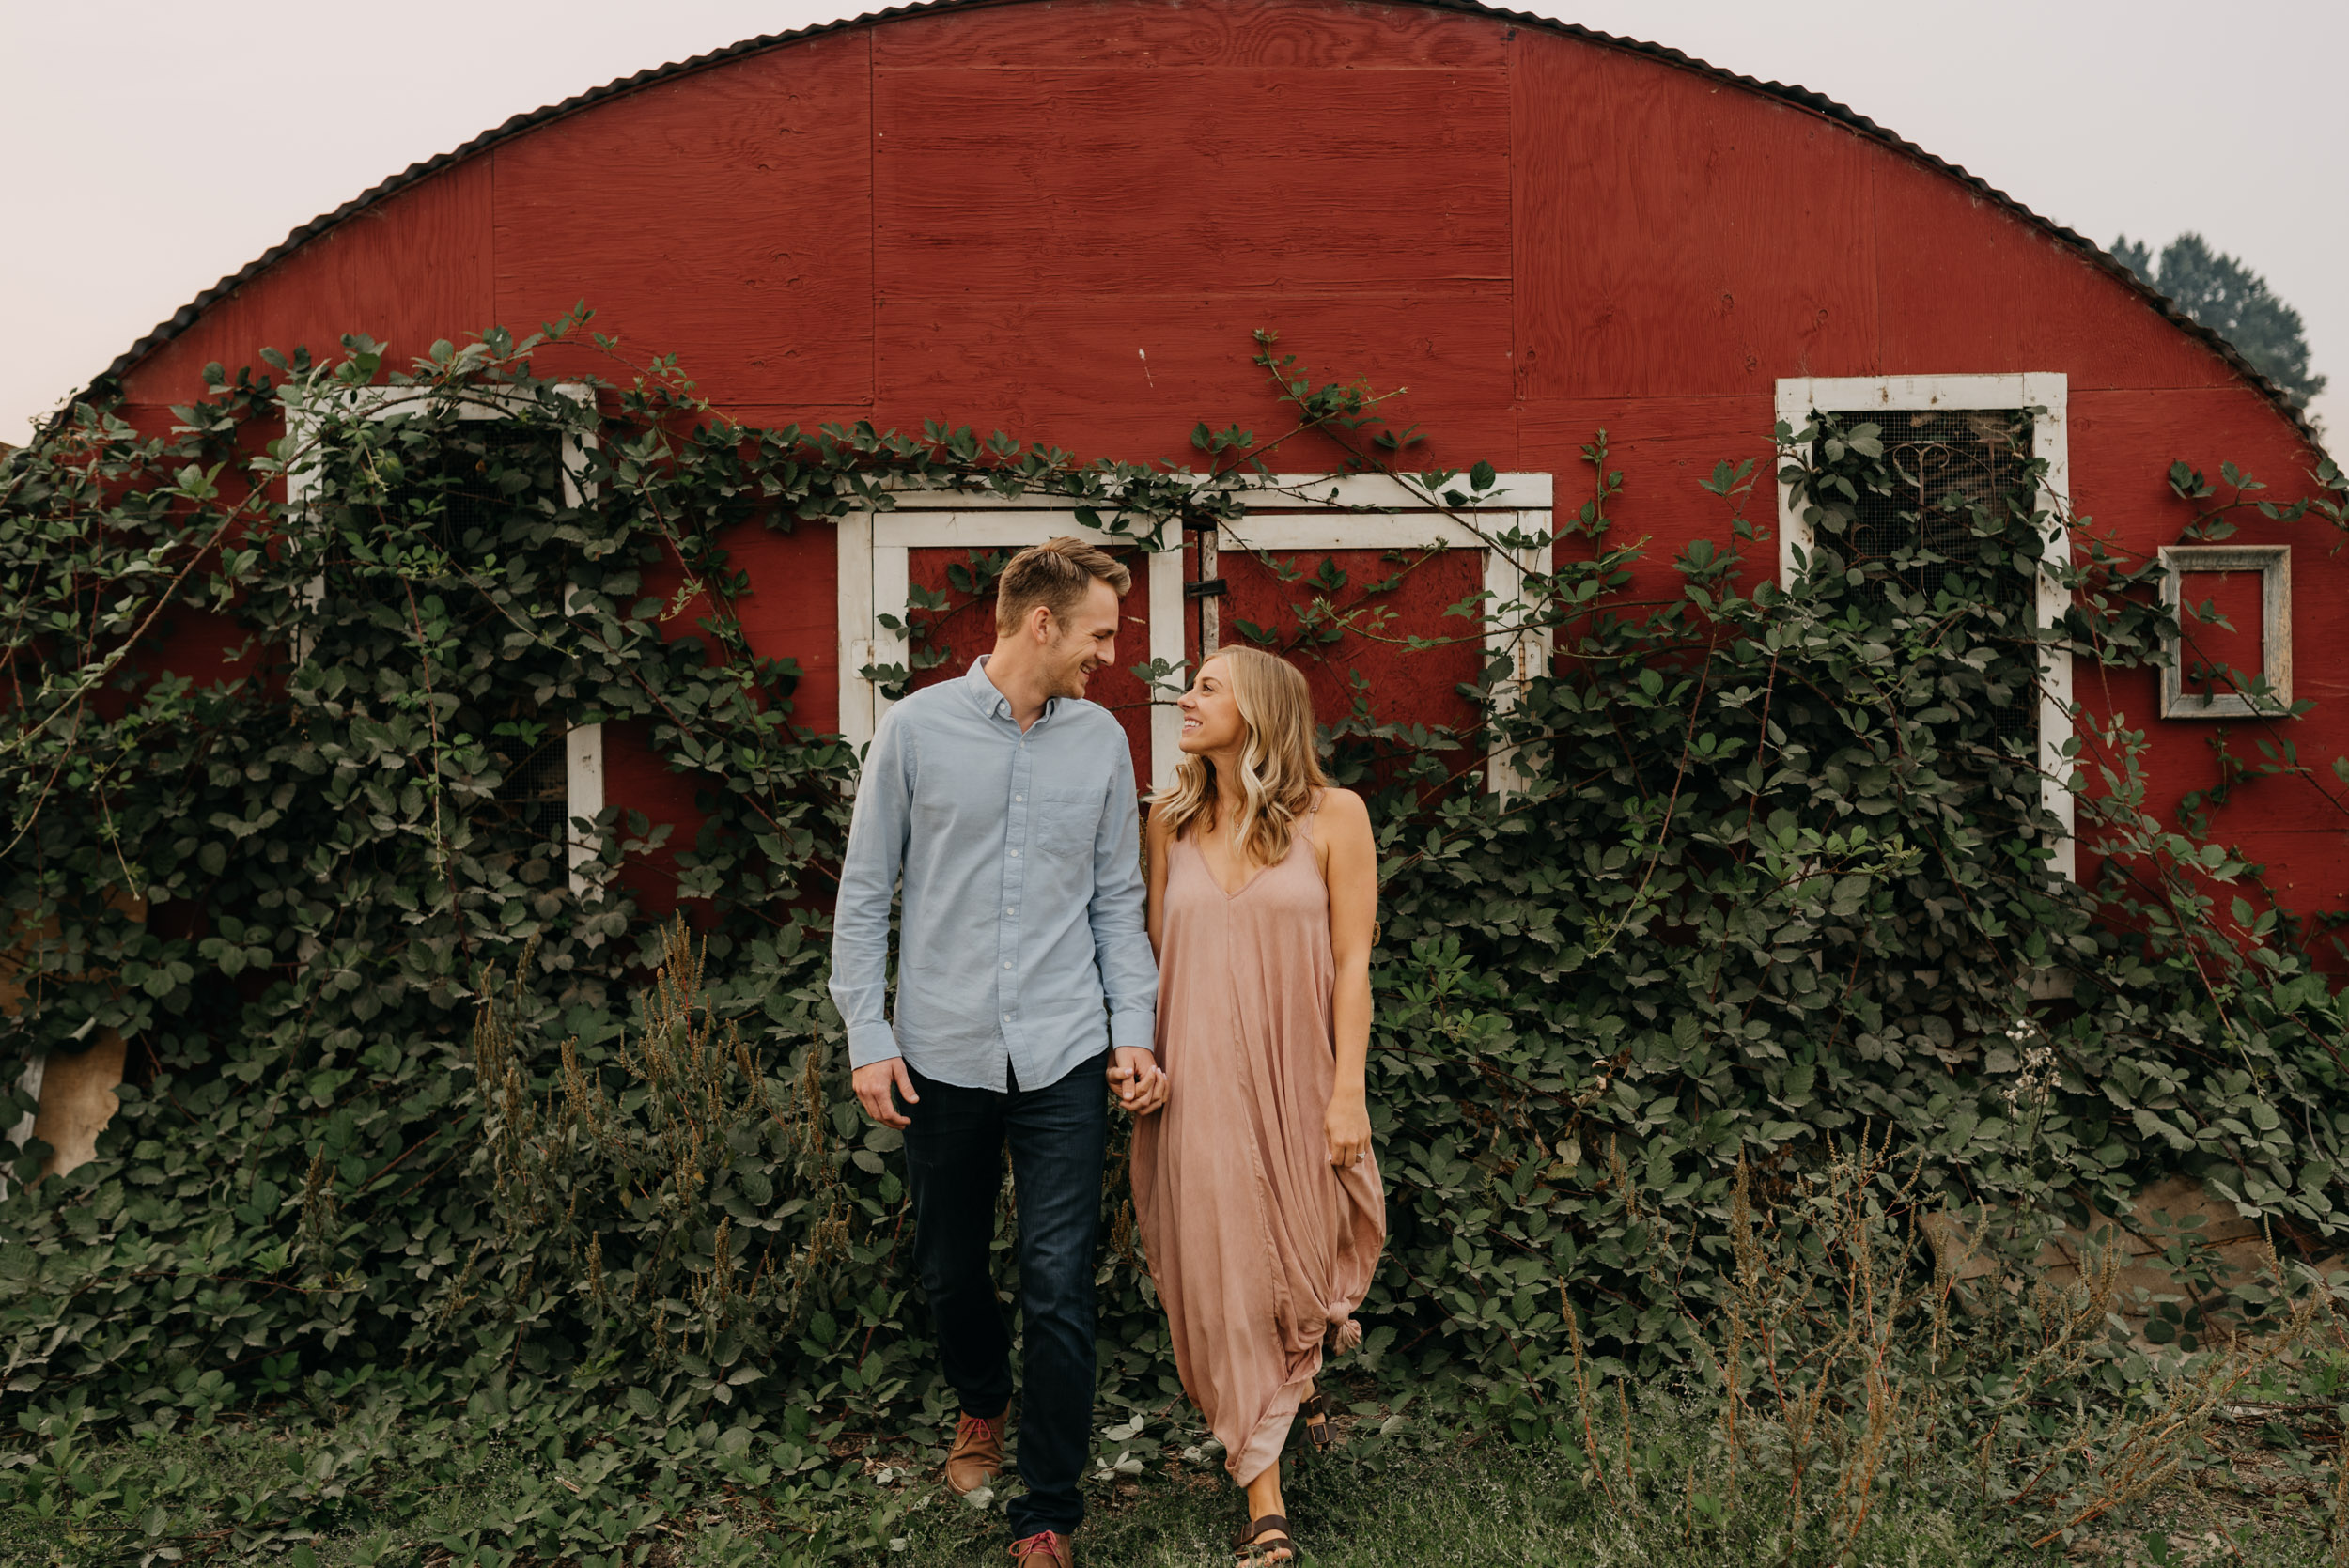 Oregon-Red-Barn-Door-Engagement-Sauvie-3424.jpg